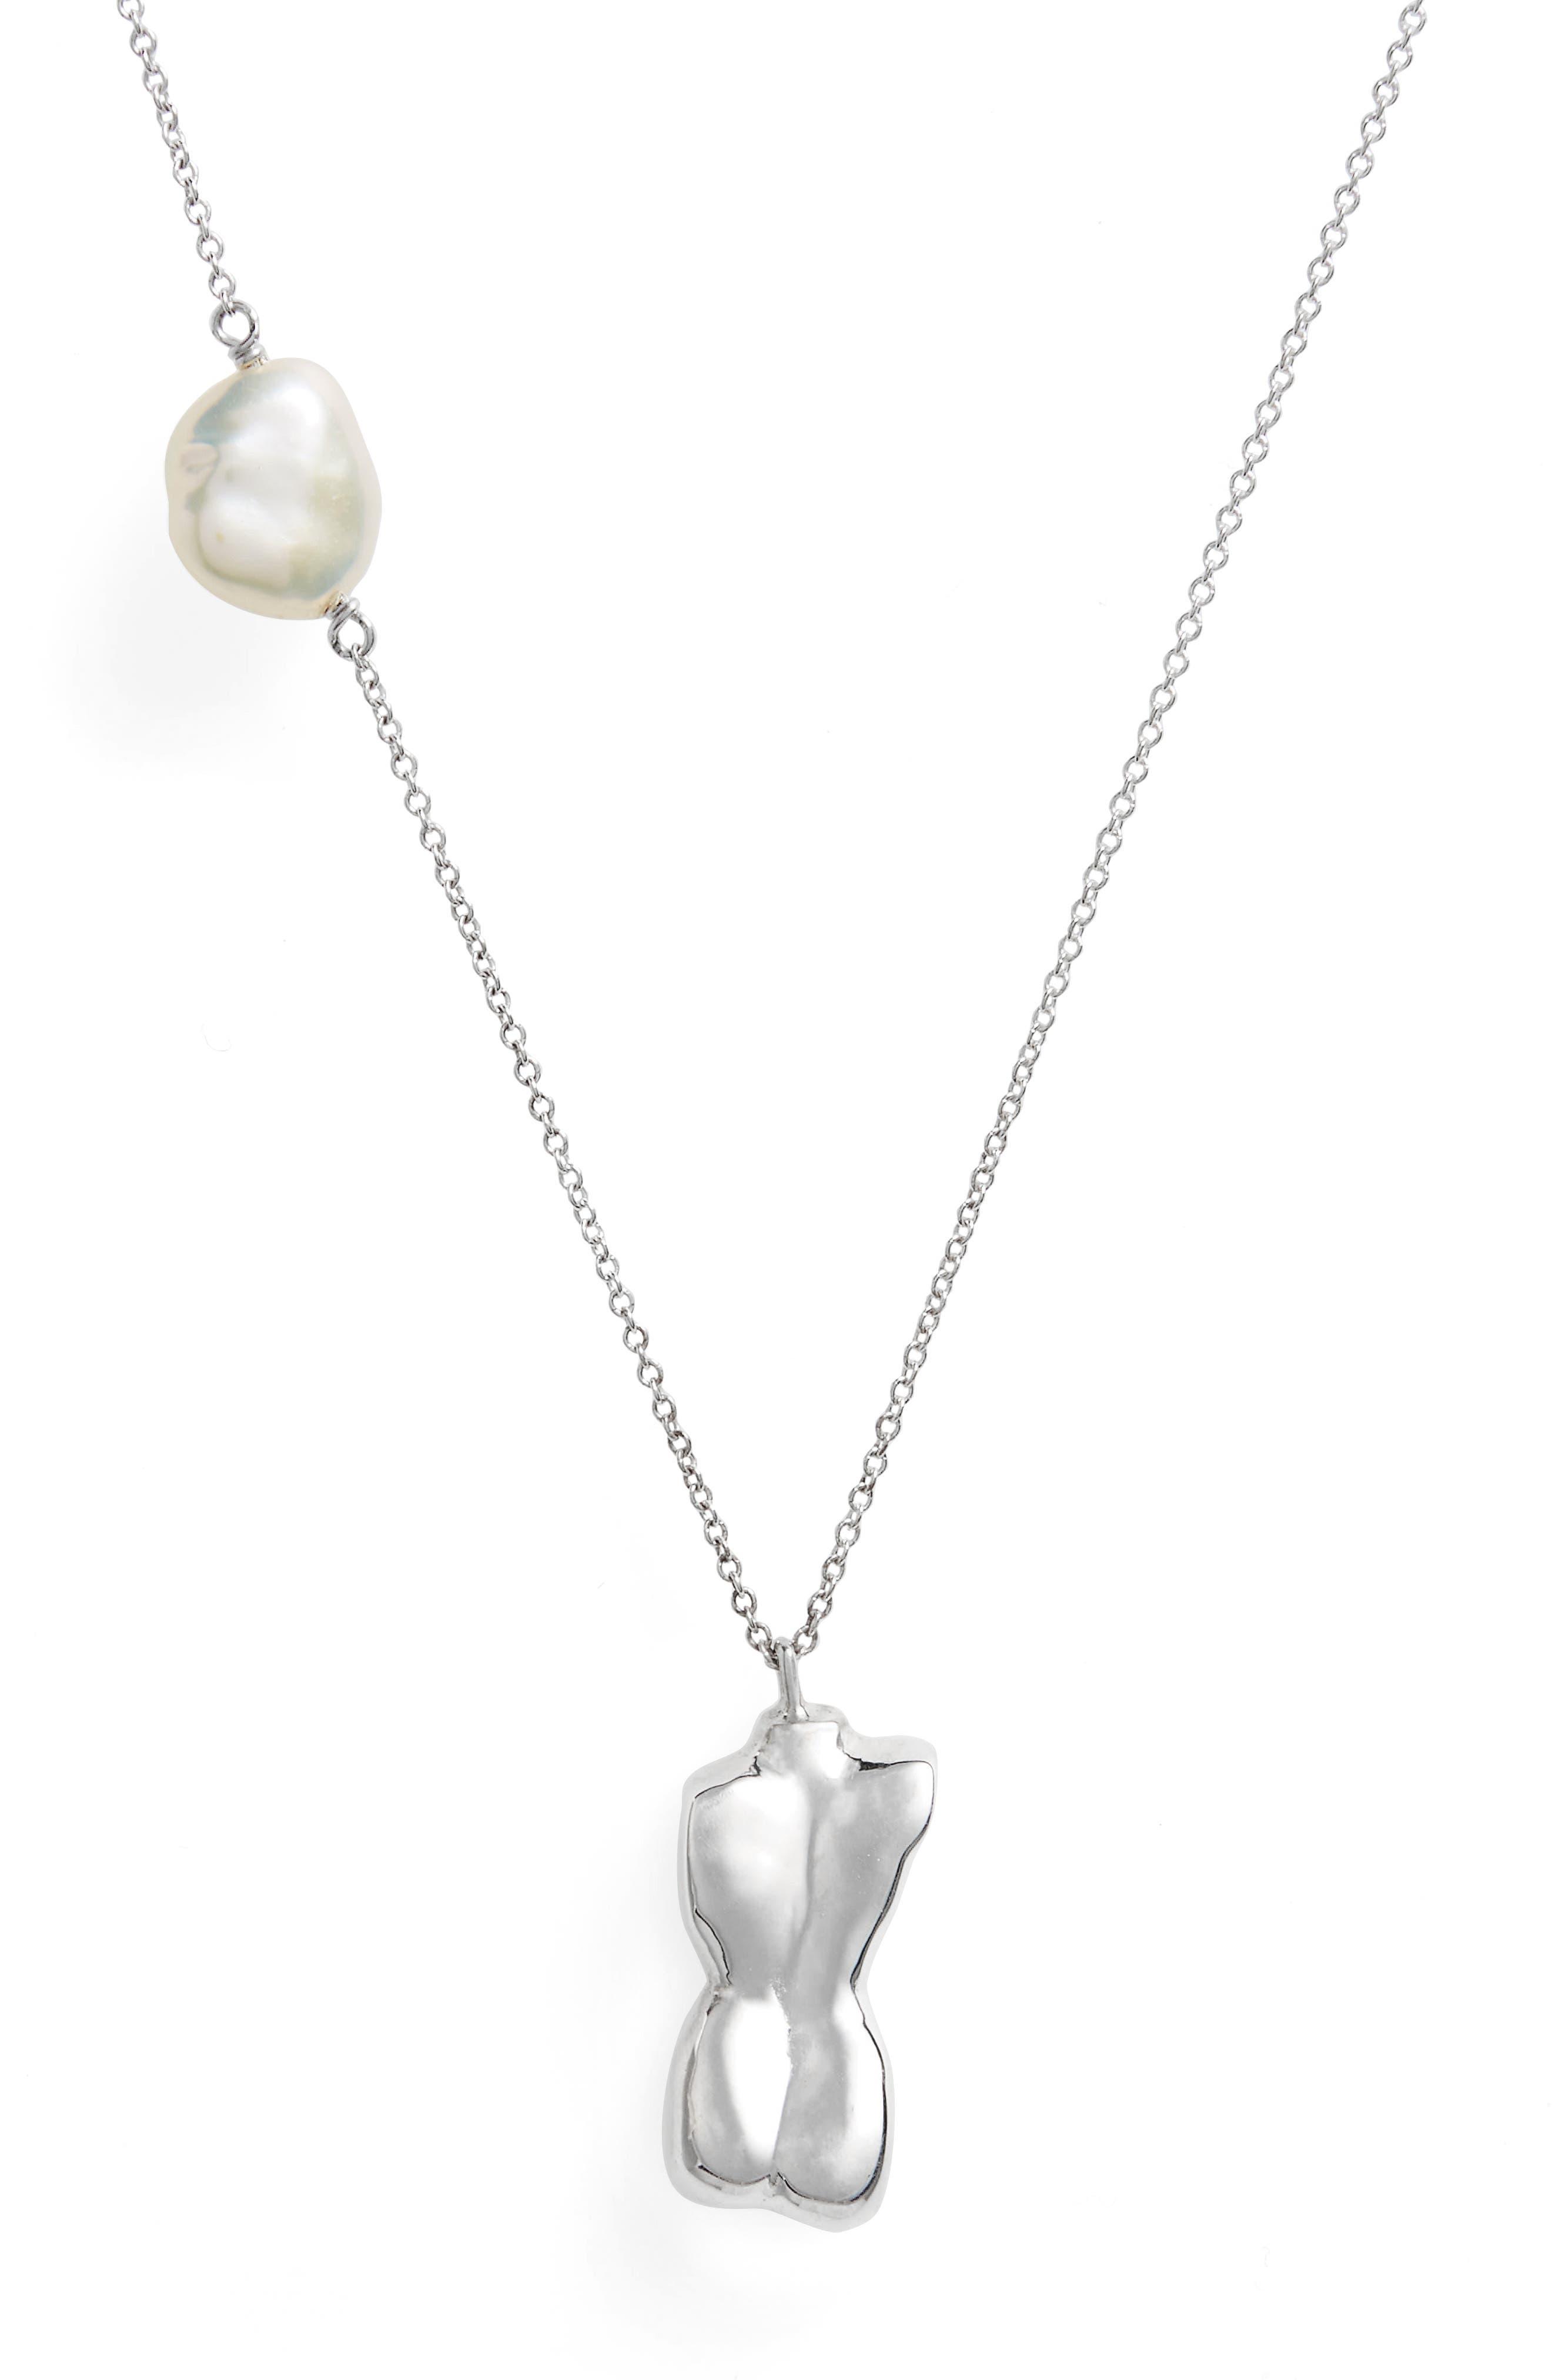 Bod Pendant Necklace,                             Alternate thumbnail 2, color,                             STERLING SILVER/ WHITE KESHI